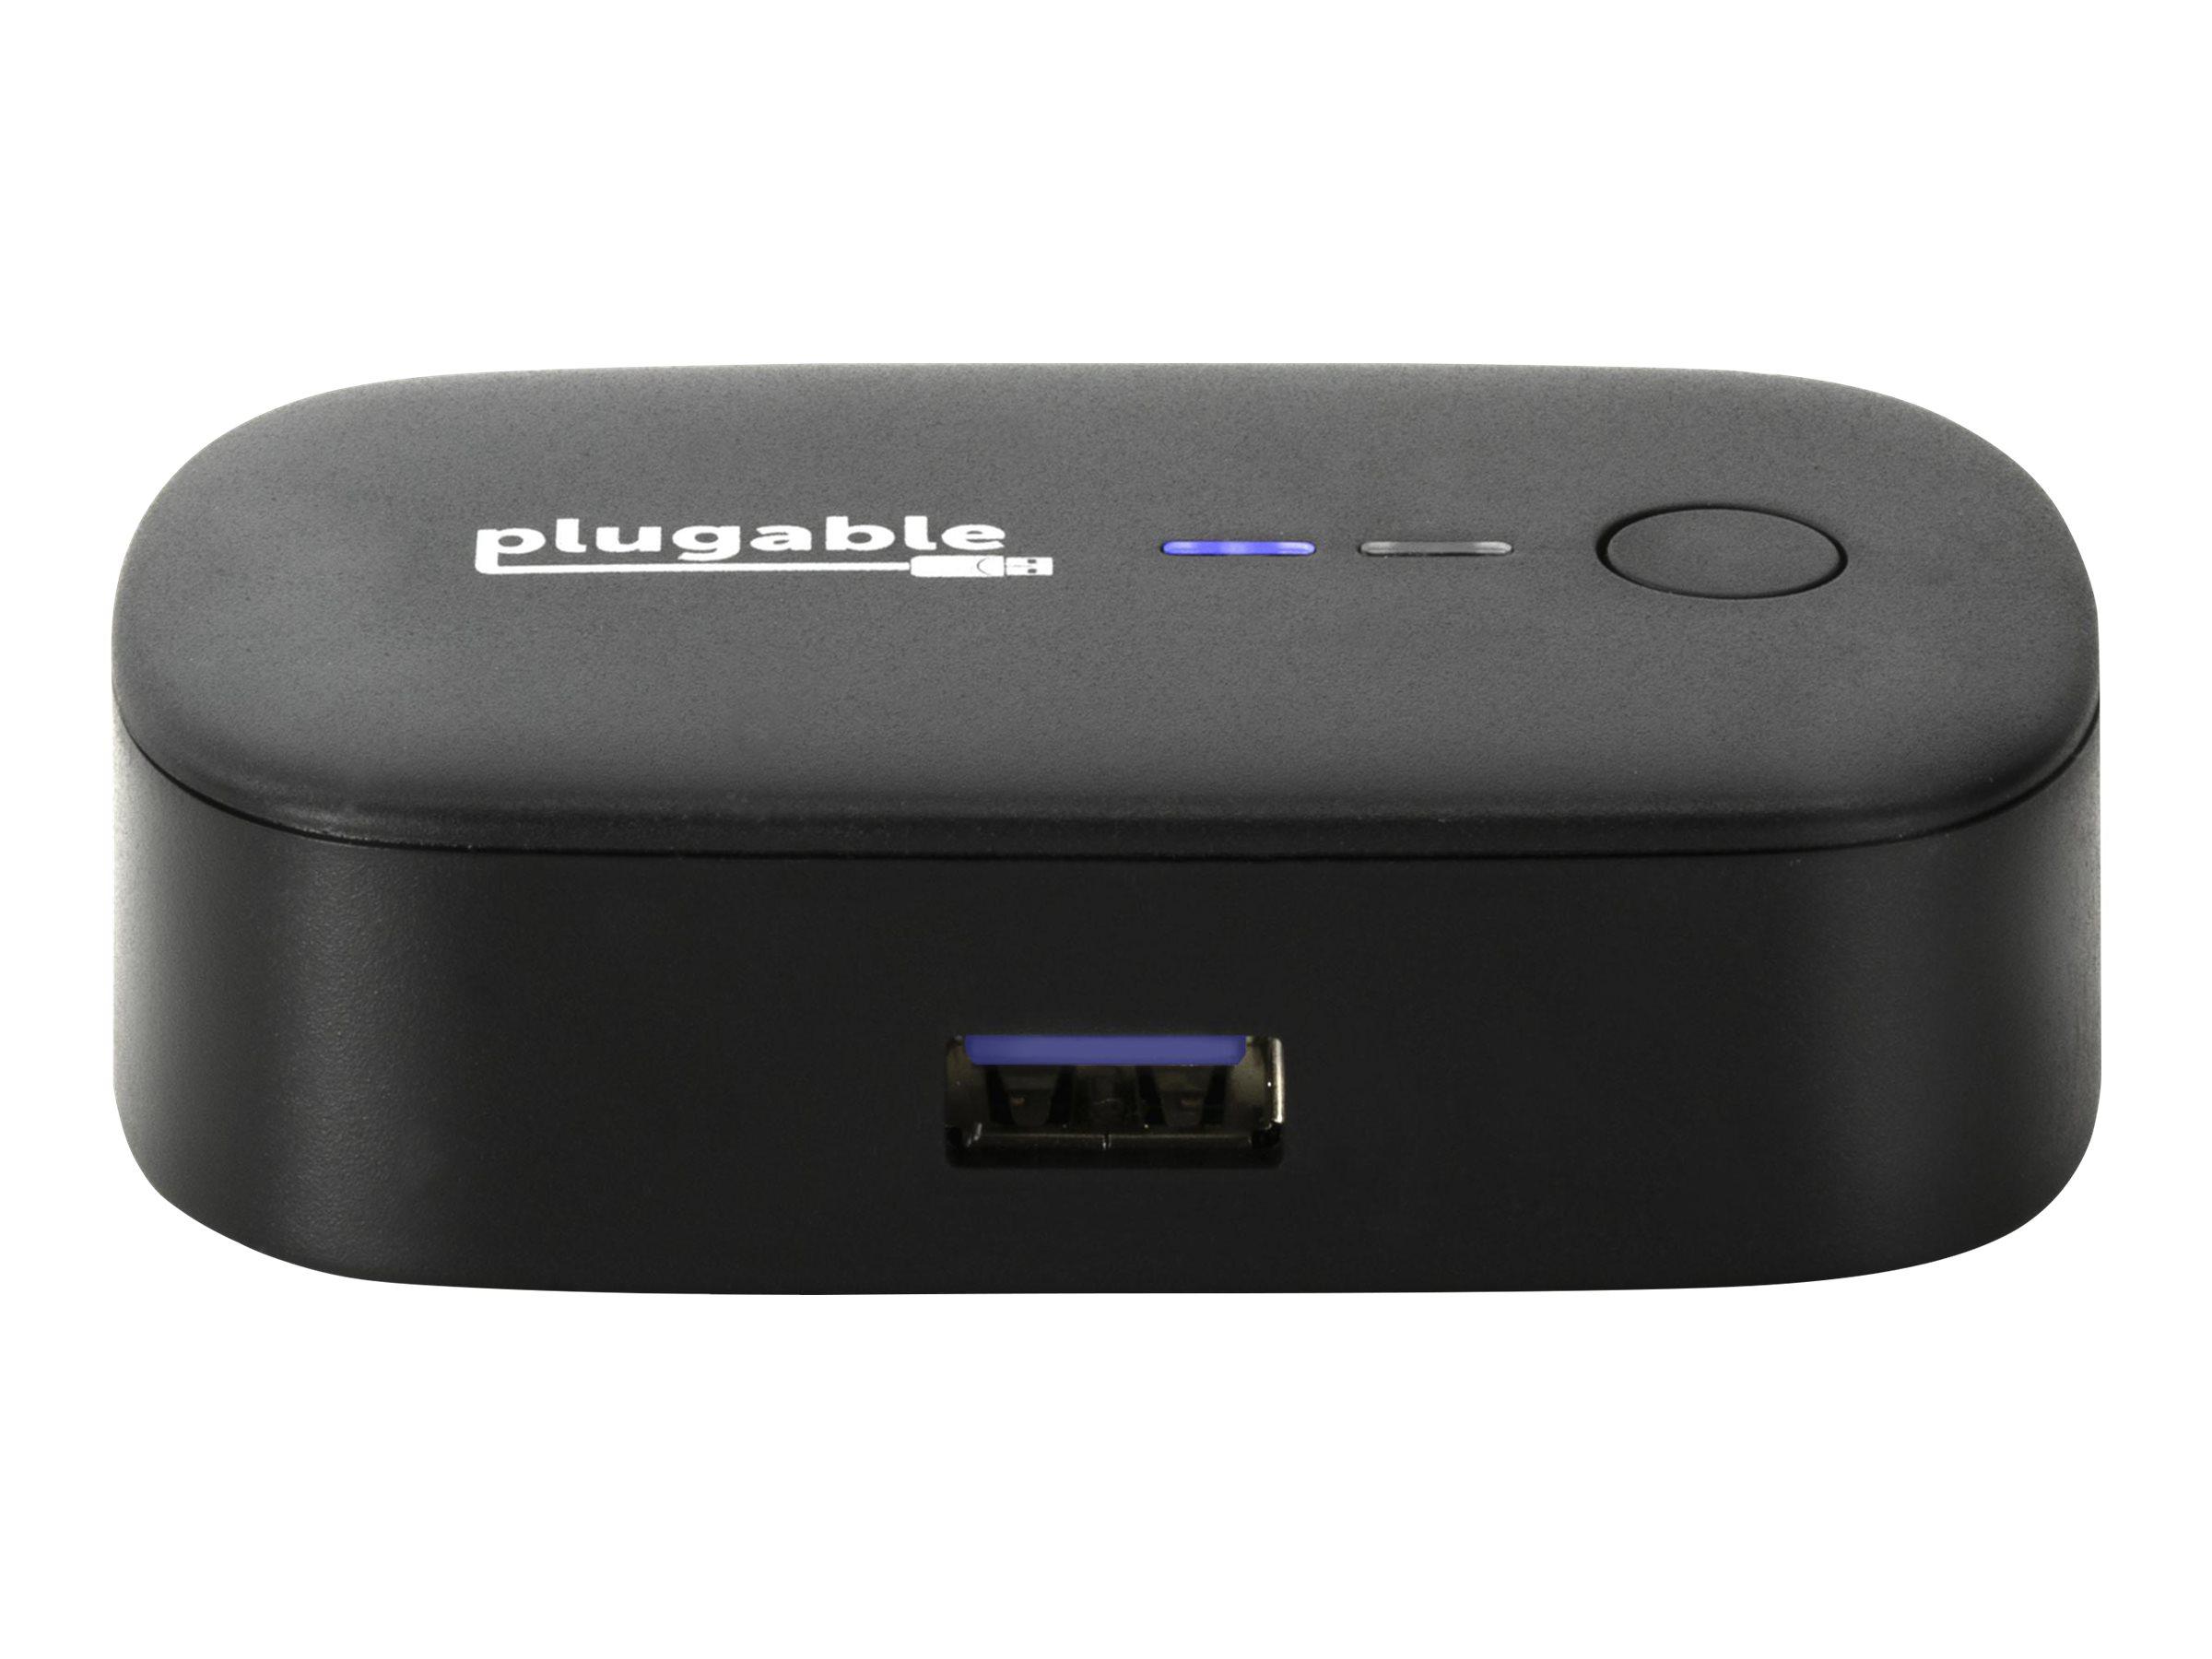 Plugable - USB peripheral sharing switch - 2 ports